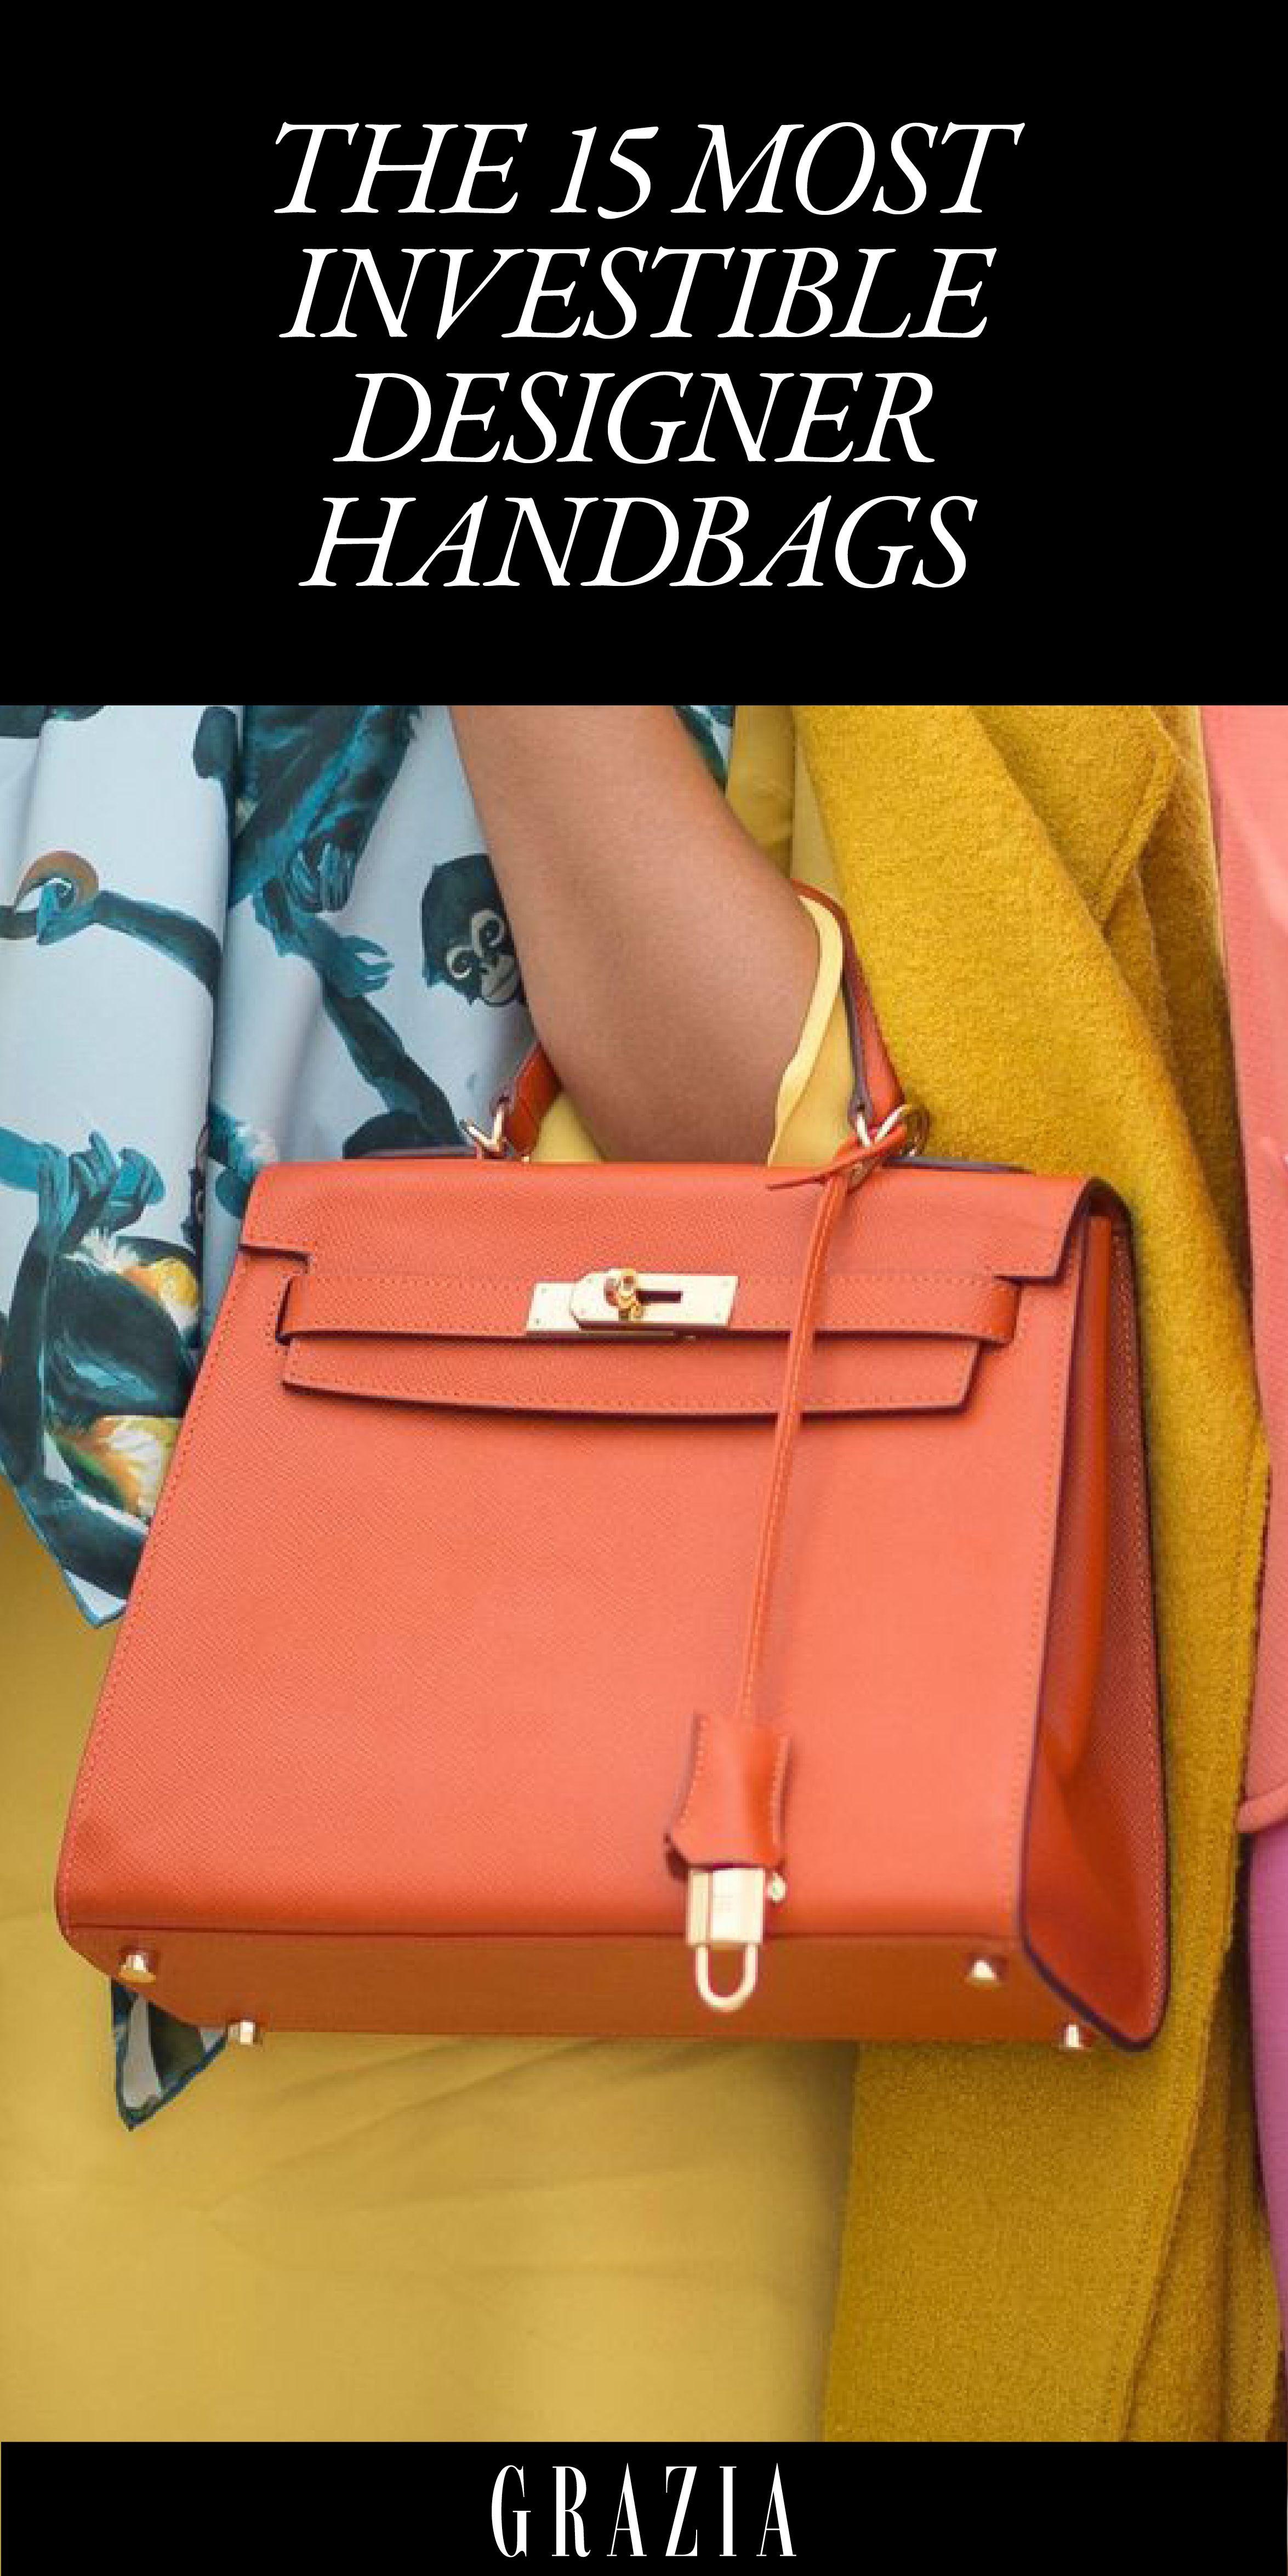 The 15 Most Investible Designer Handbags